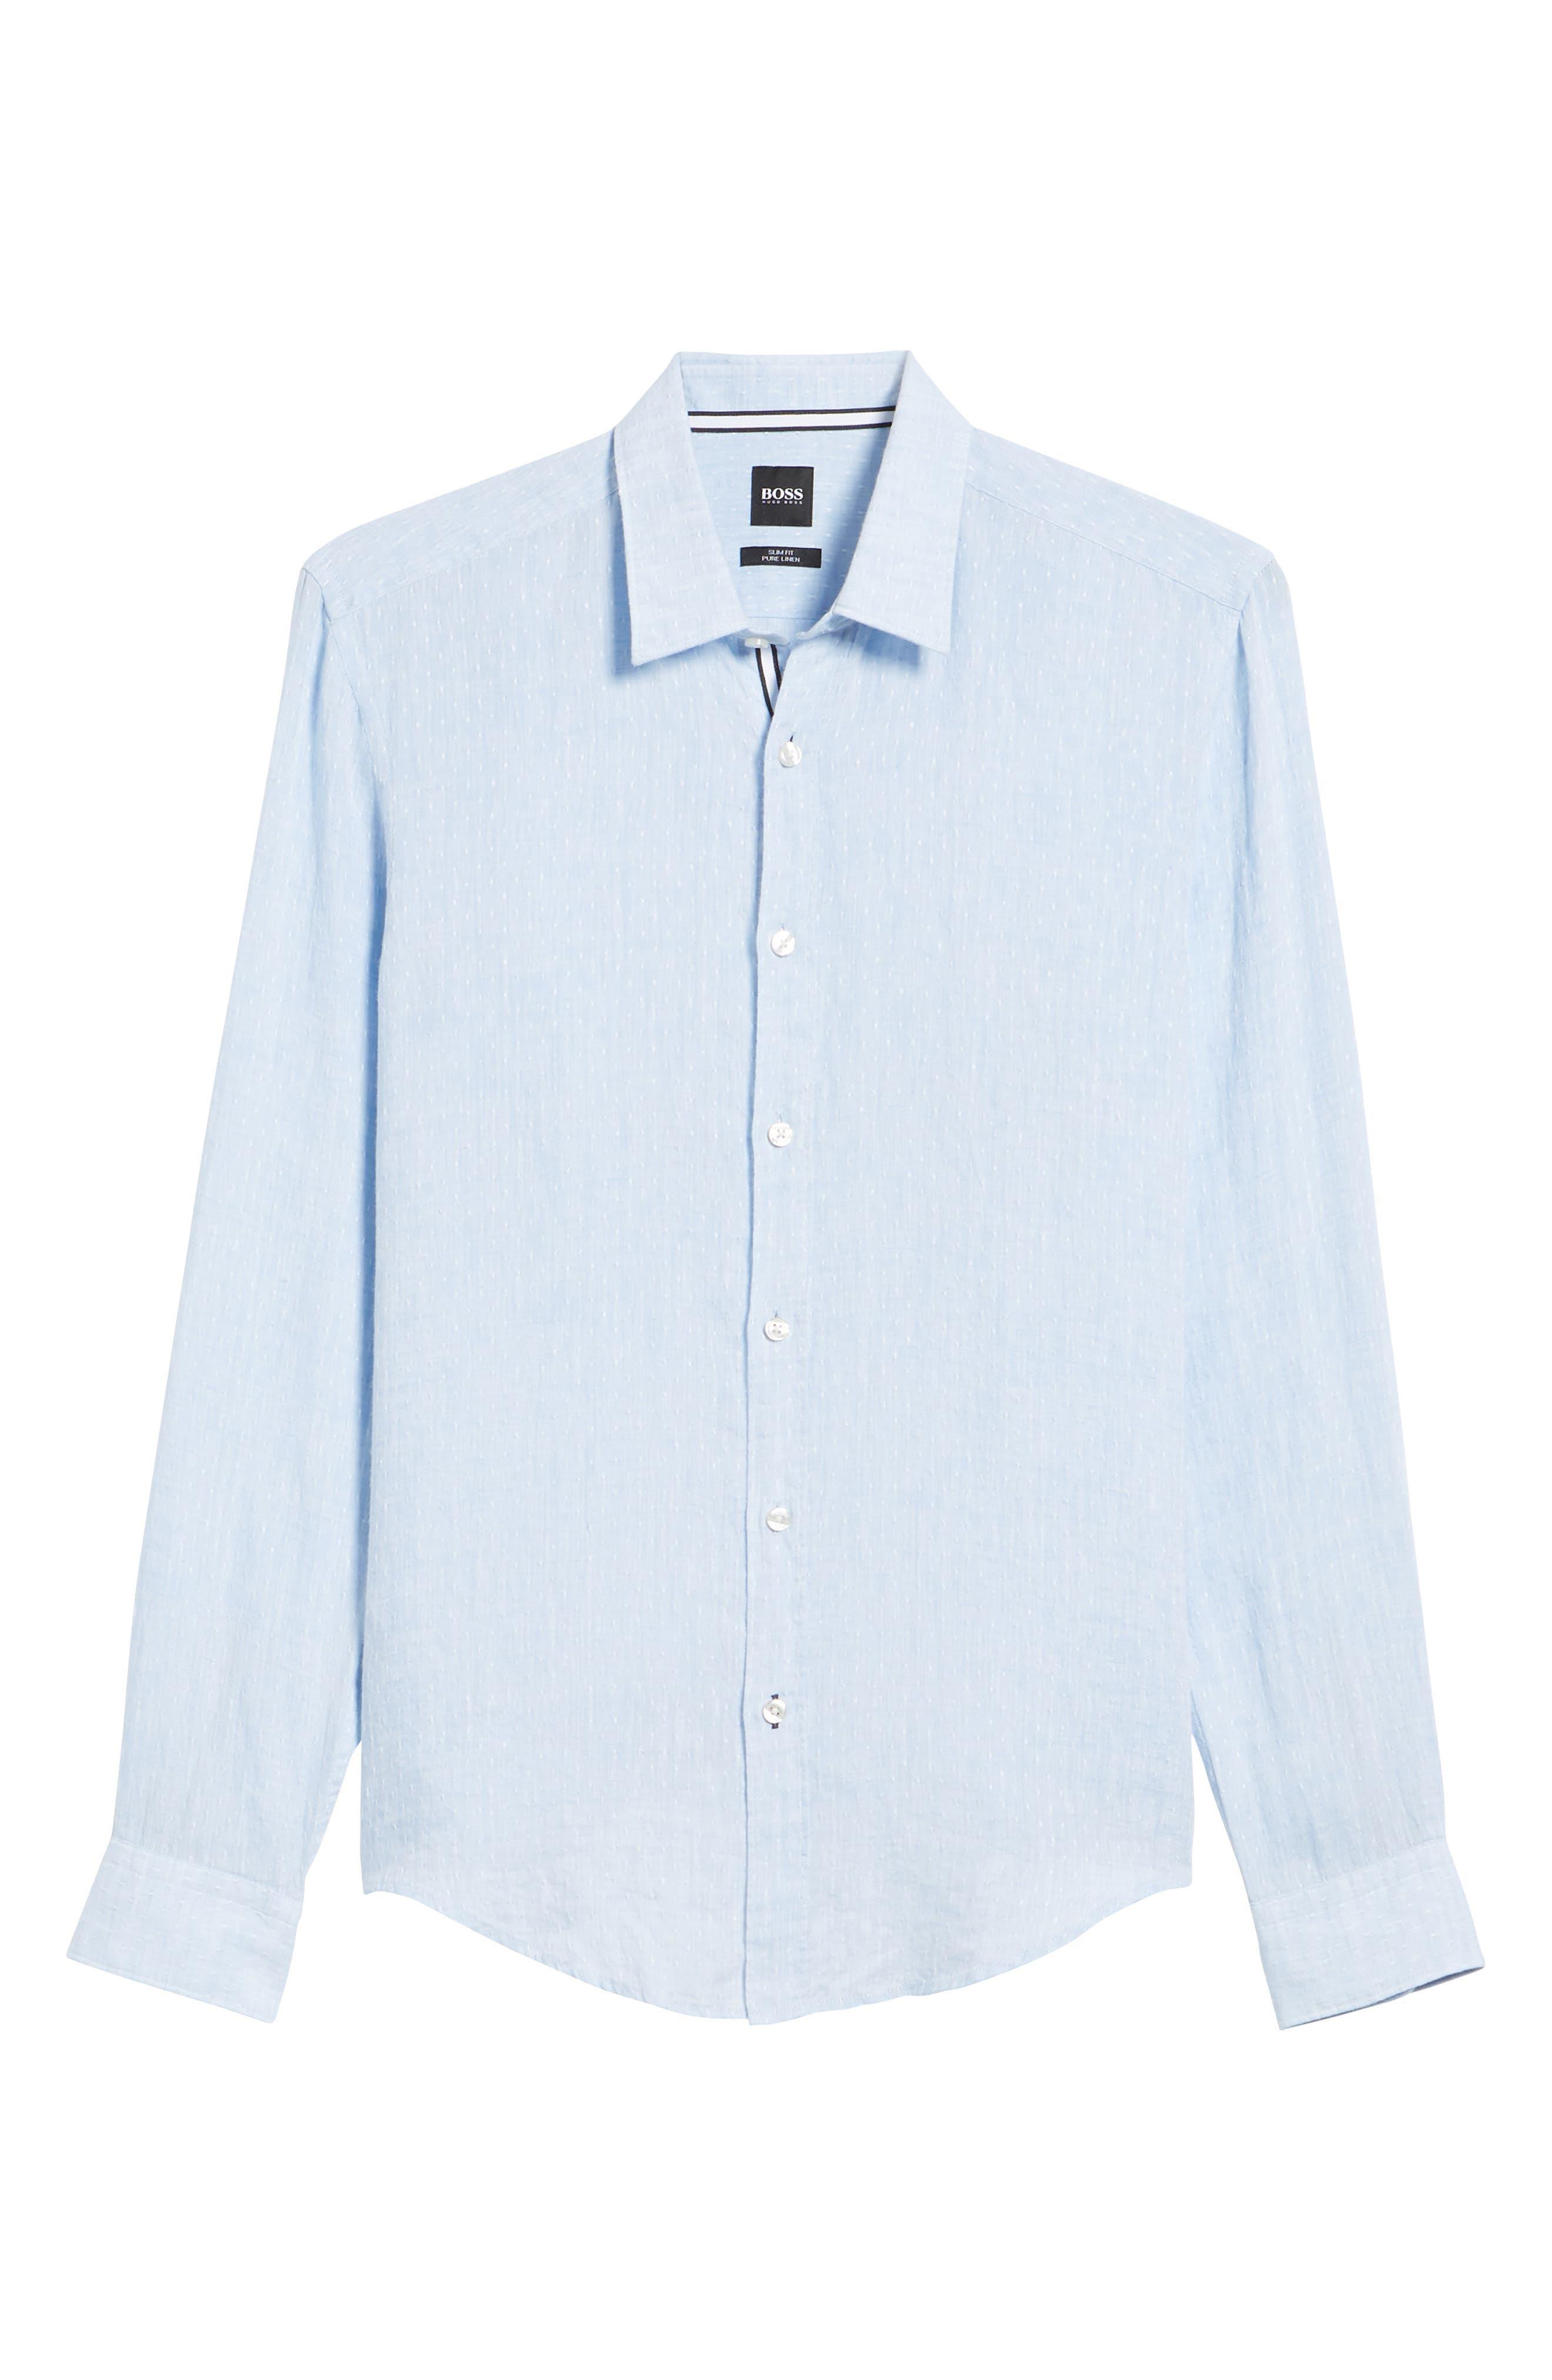 Ronni Slim Fit Dobby Linen Sport Shirt,                             Alternate thumbnail 6, color,                             Blue